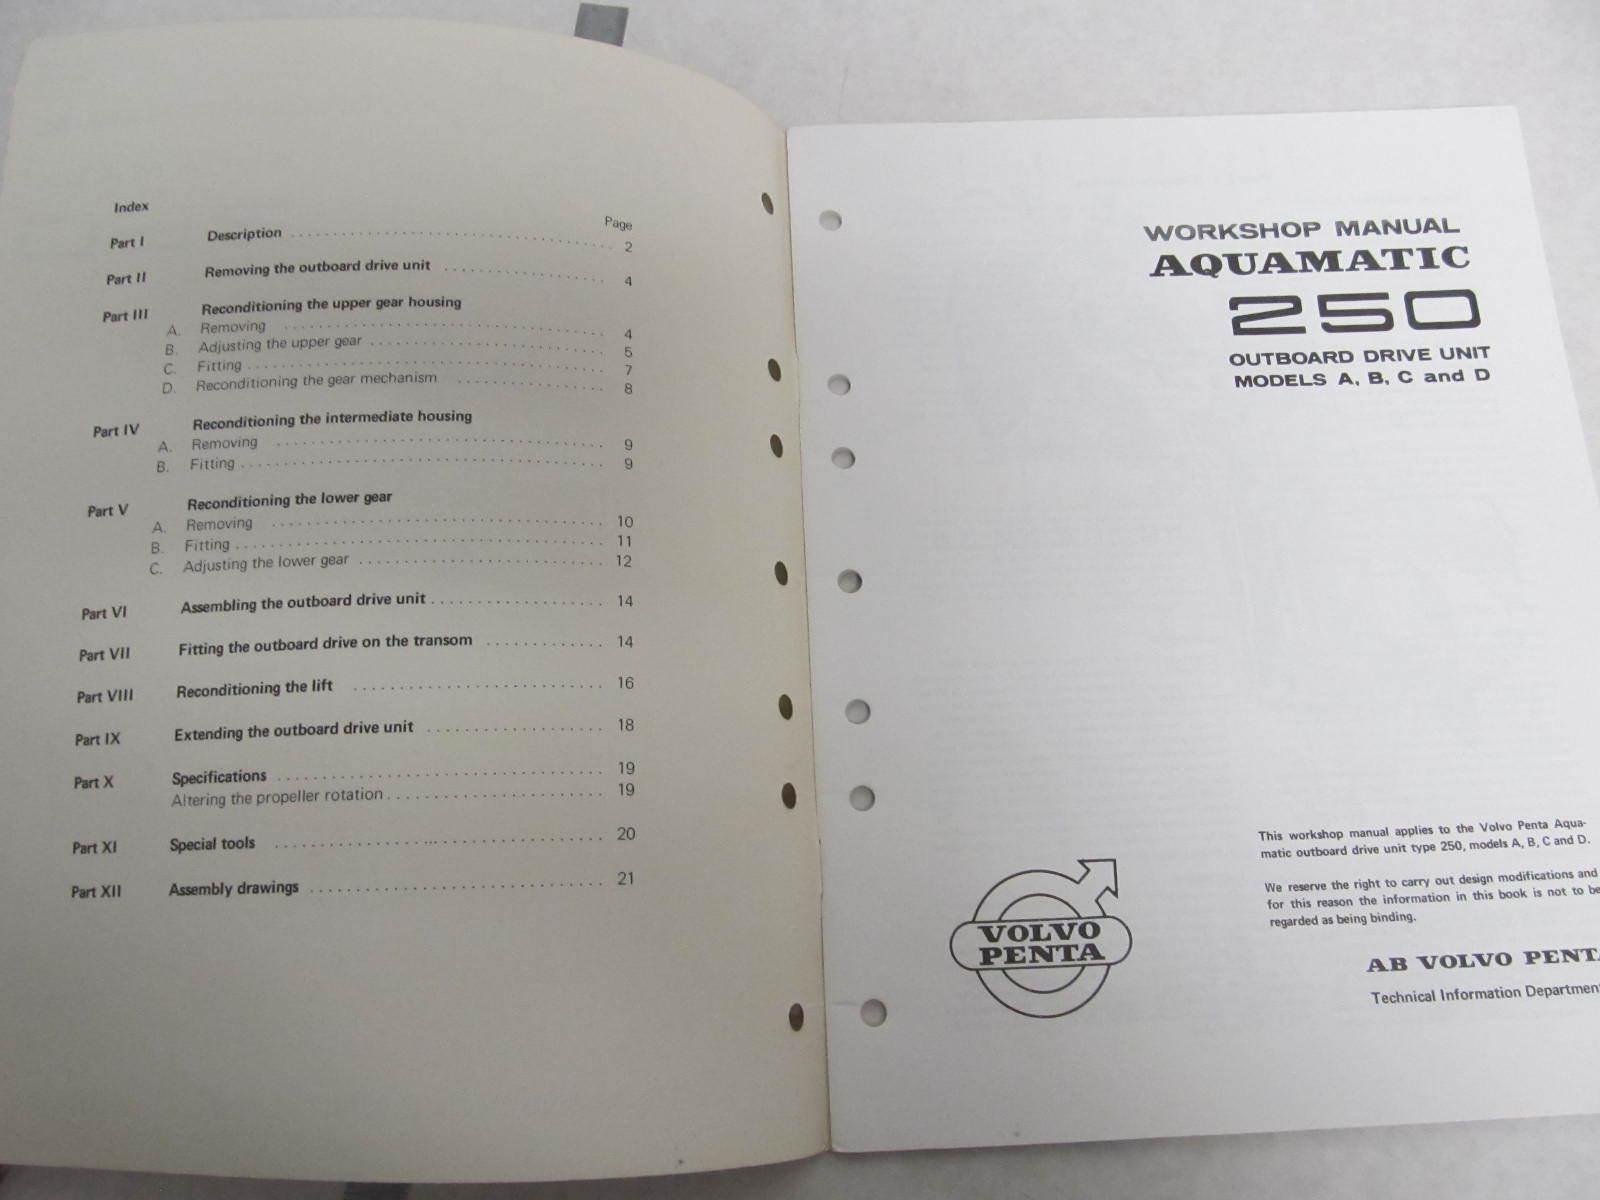 2284 1969 volvo penta aquamatic 250 service workshop Volvo Penta Workshop Manual Volvo Penta Troubleshooting